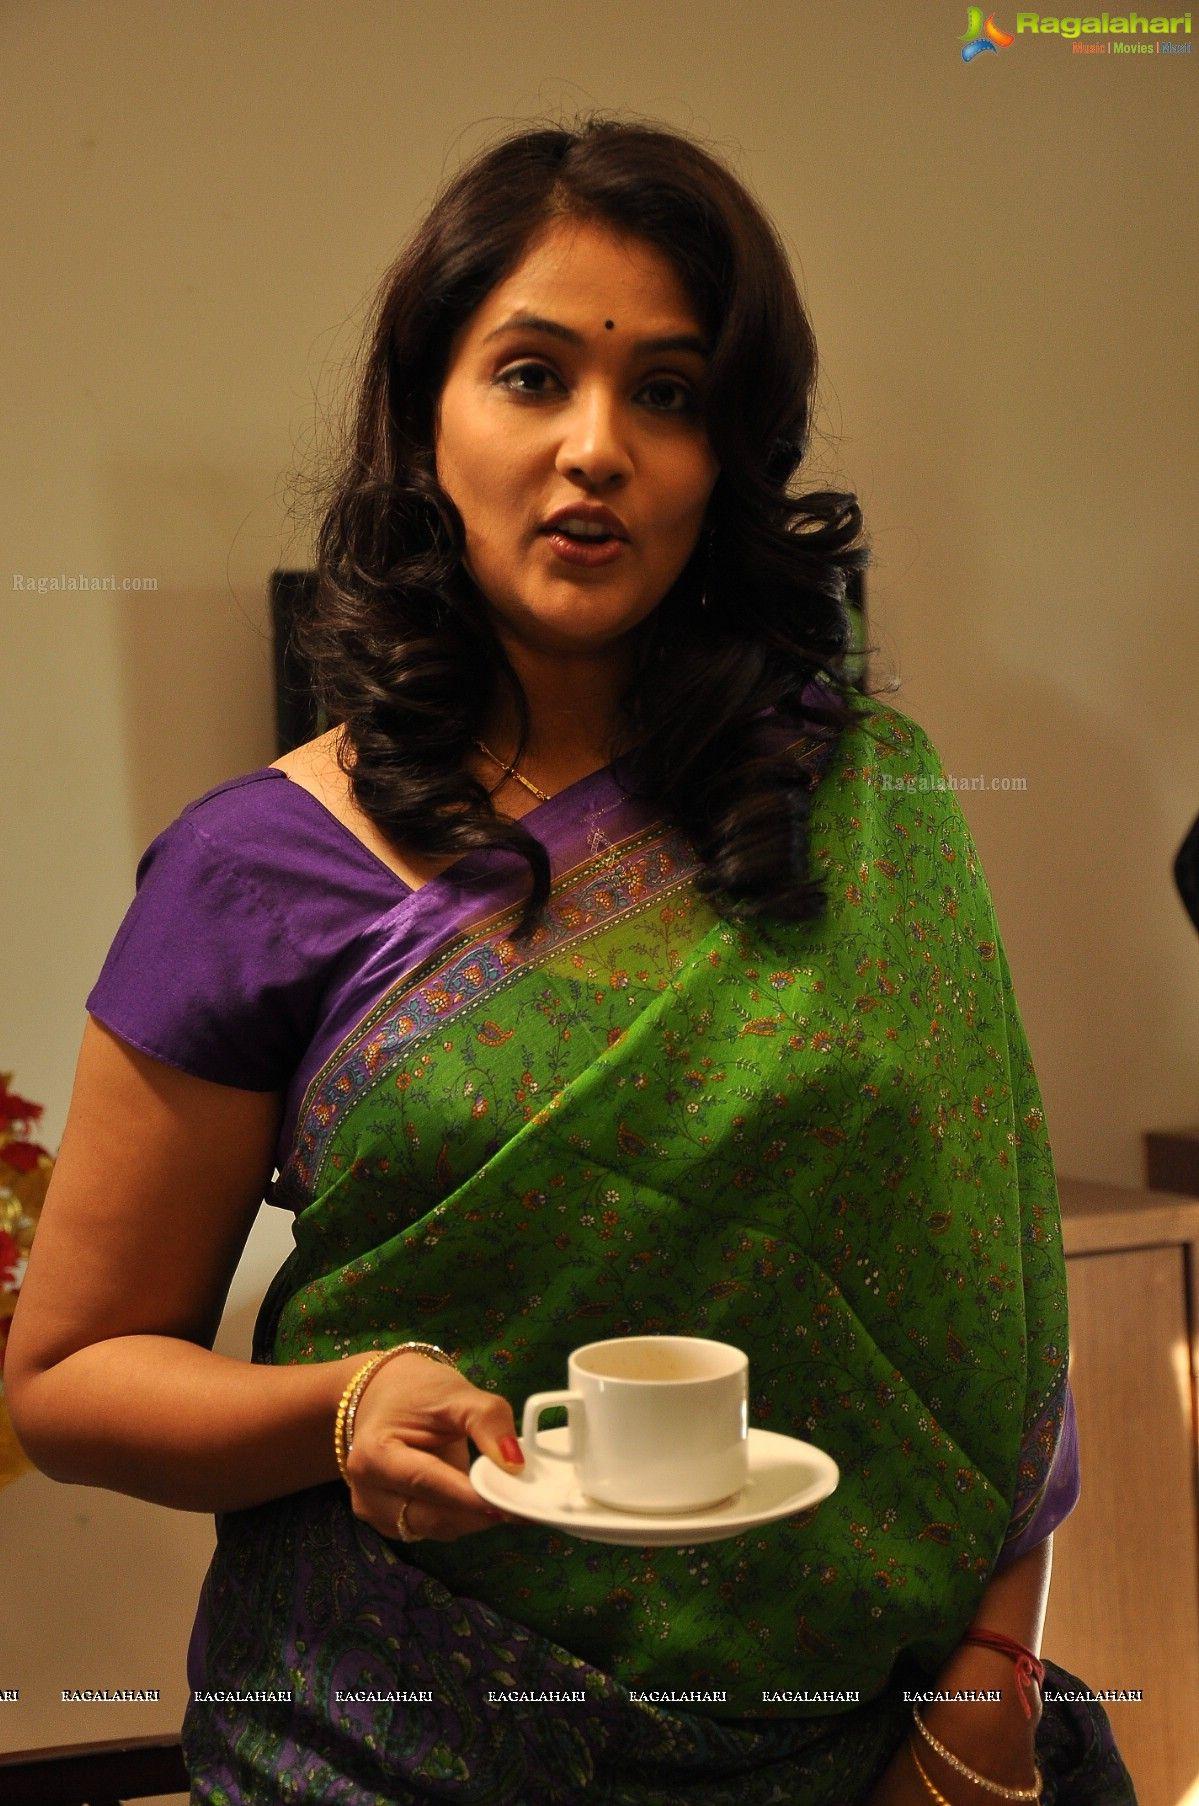 Gayatri Bhargavi Image 7 Tollywood Actress Photos Telugu Actress Photos Stills Tollywood Photoshoot Actresses Actress Pics Actress Photos